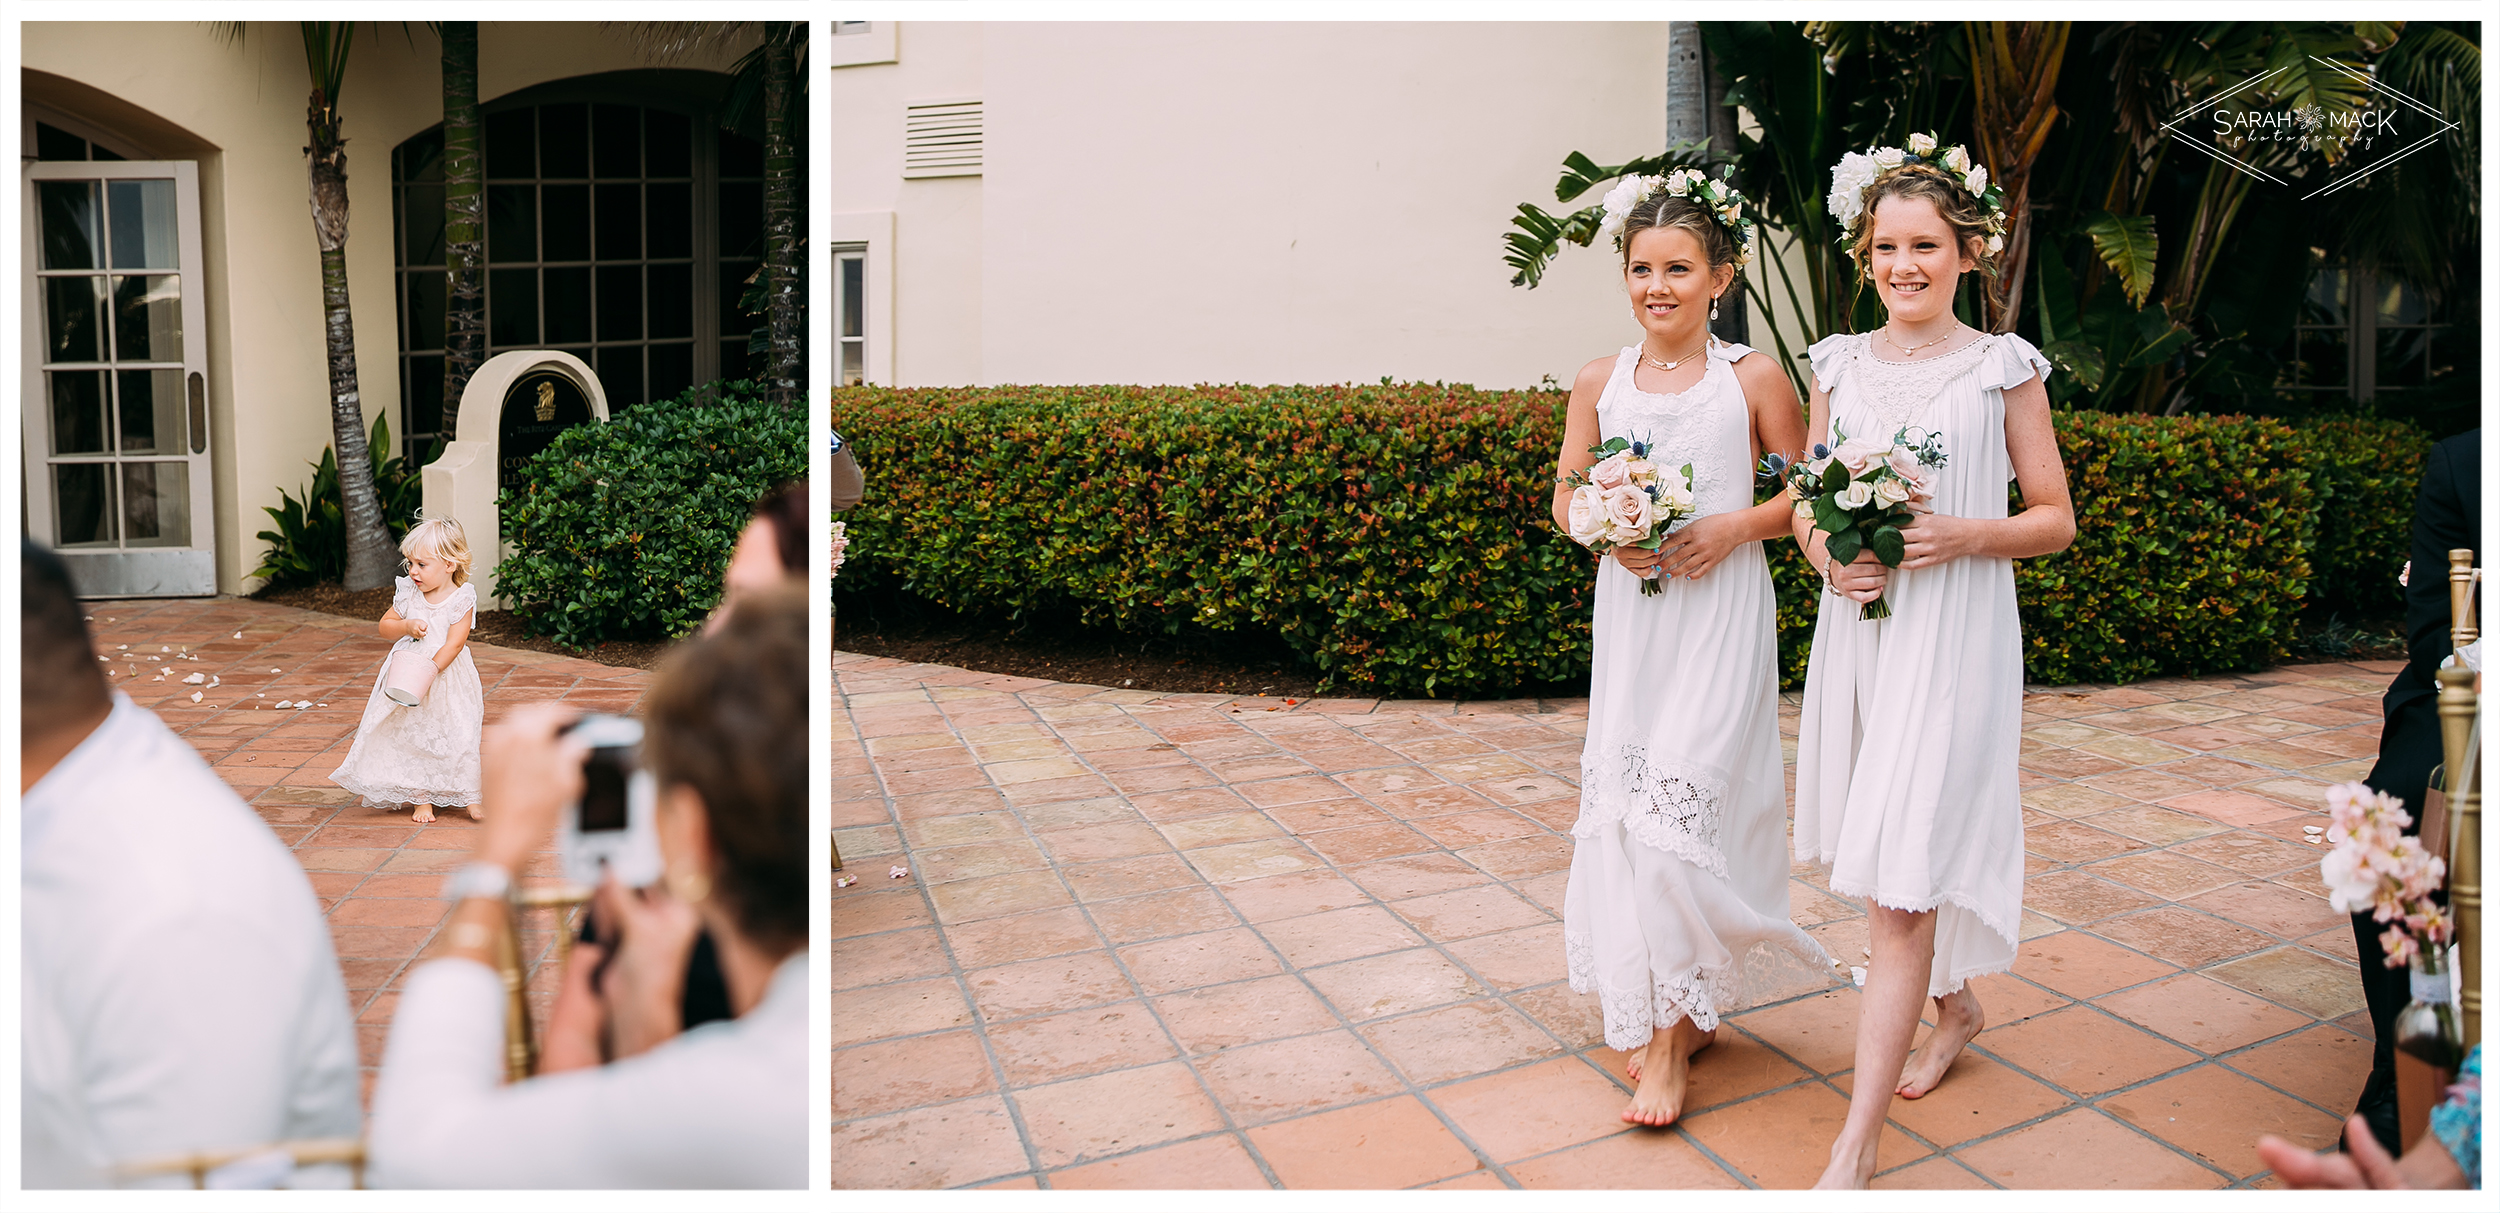 TD-Ritz-Carlton-Laguna-Niguel-Wedding-Photography-15.jpg